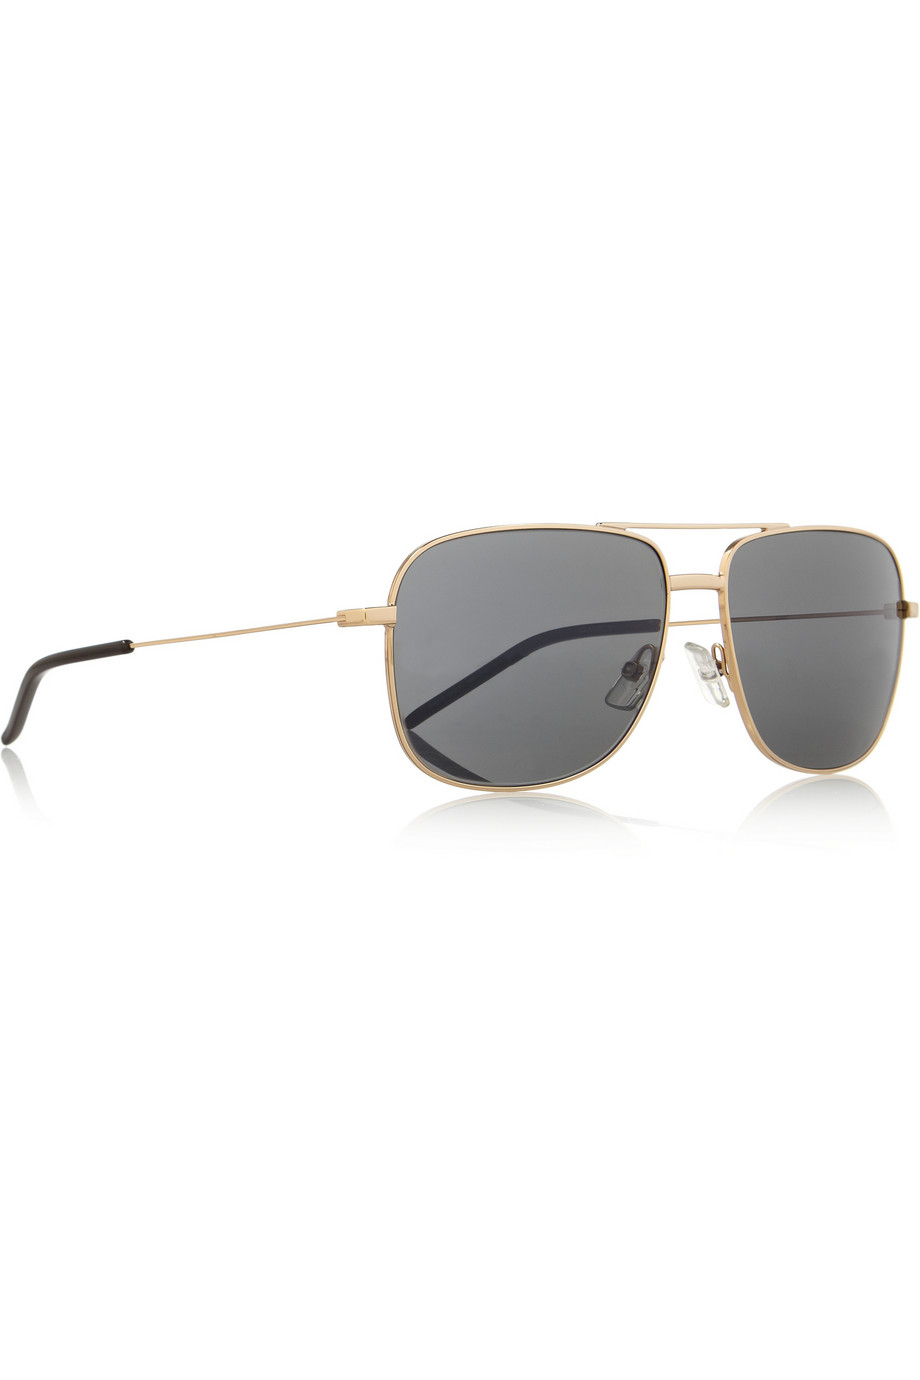 60d8d5a803dd Saint Laurent Square-Frame Acetate Aviator-Style Sunglasses in ...